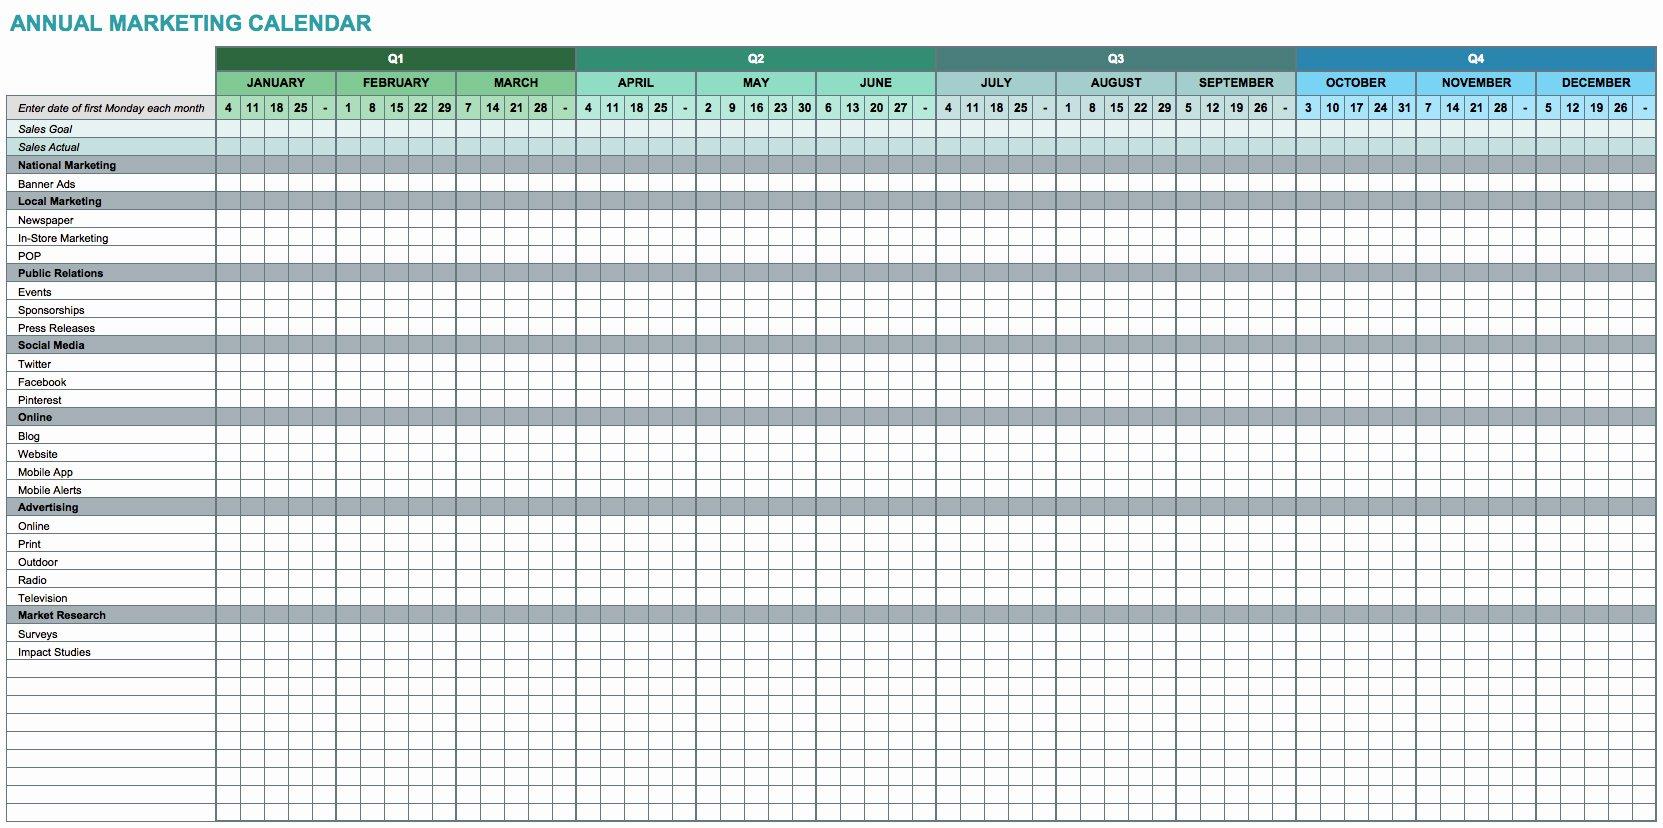 Excel Calendar Schedule Template Lovely 9 Free Marketing Calendar Templates for Excel Smartsheet